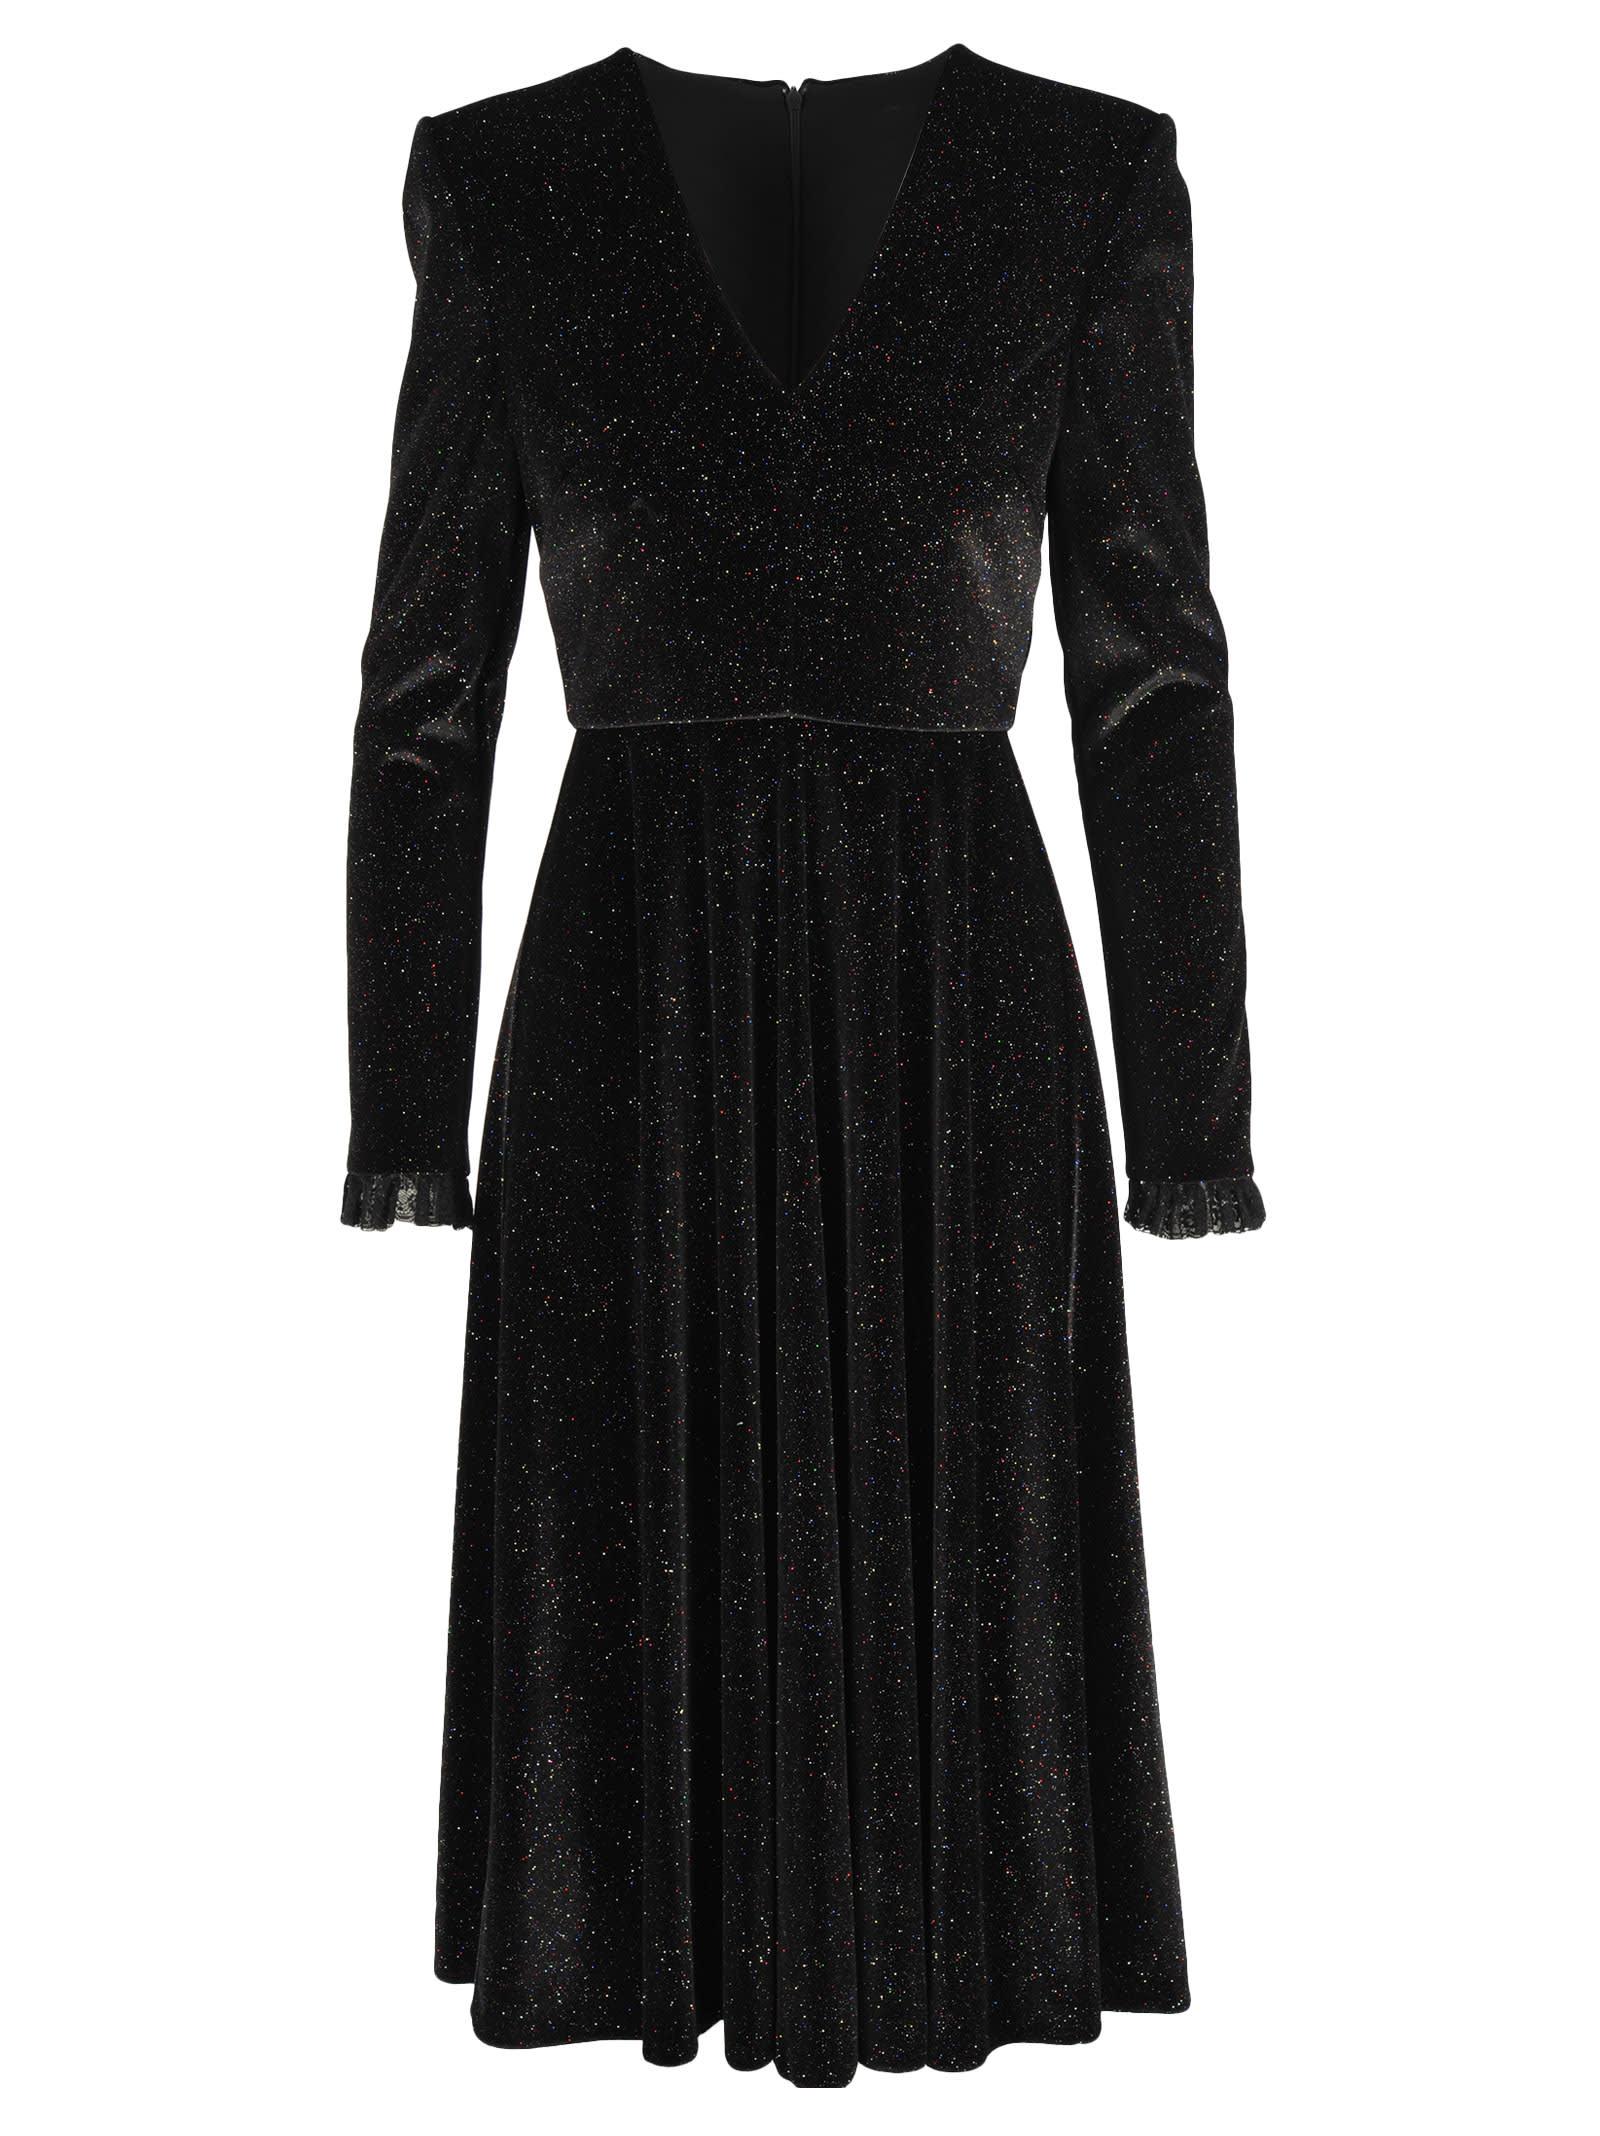 Buy Philosophy Velvet Glitter Dress online, shop Philosophy di Lorenzo Serafini with free shipping